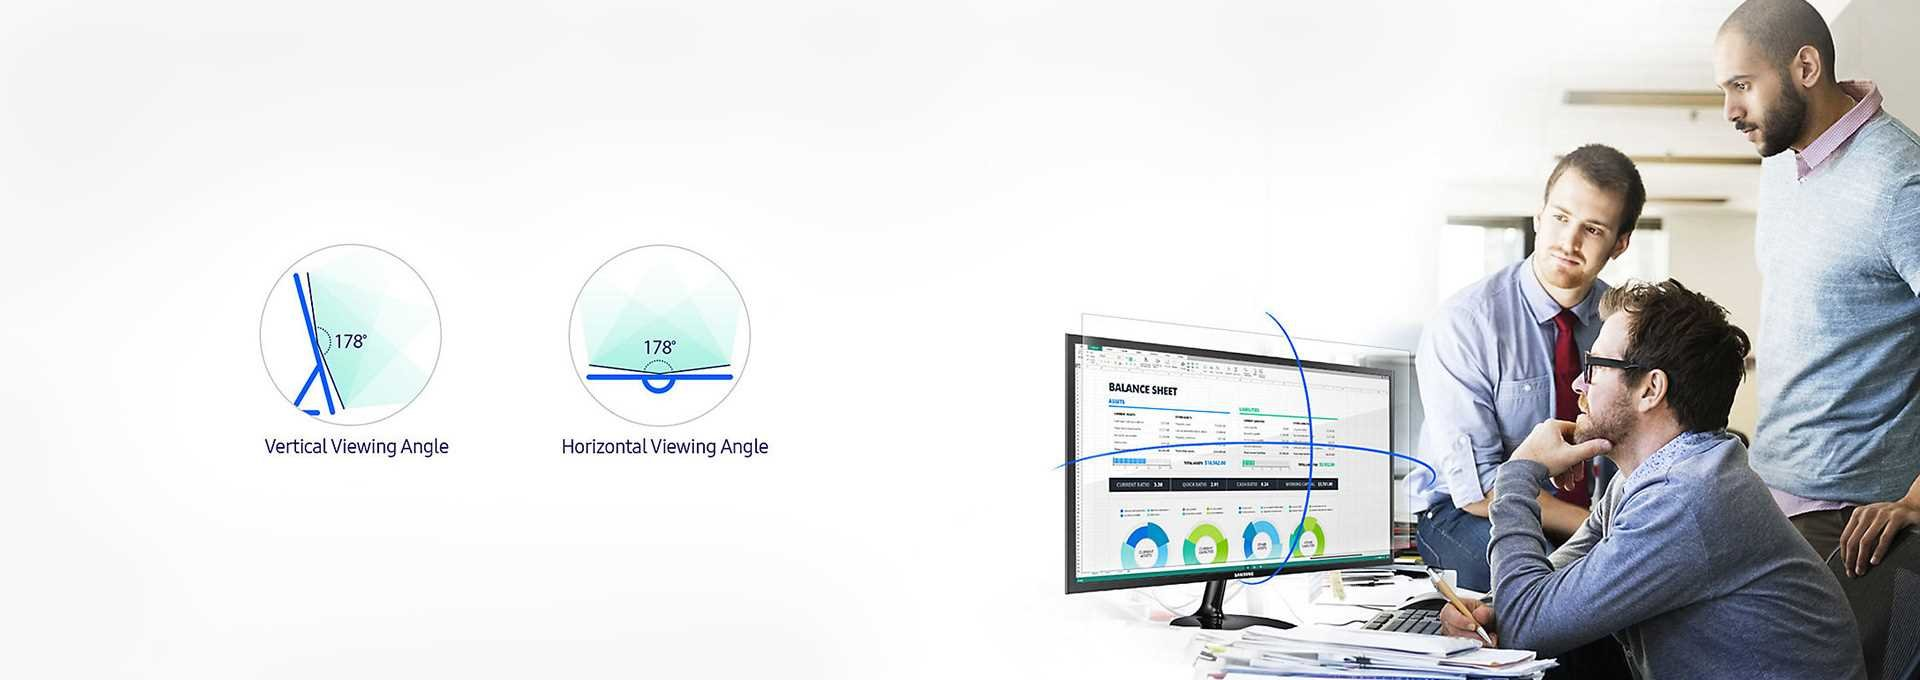 Samsung Wide View Katy